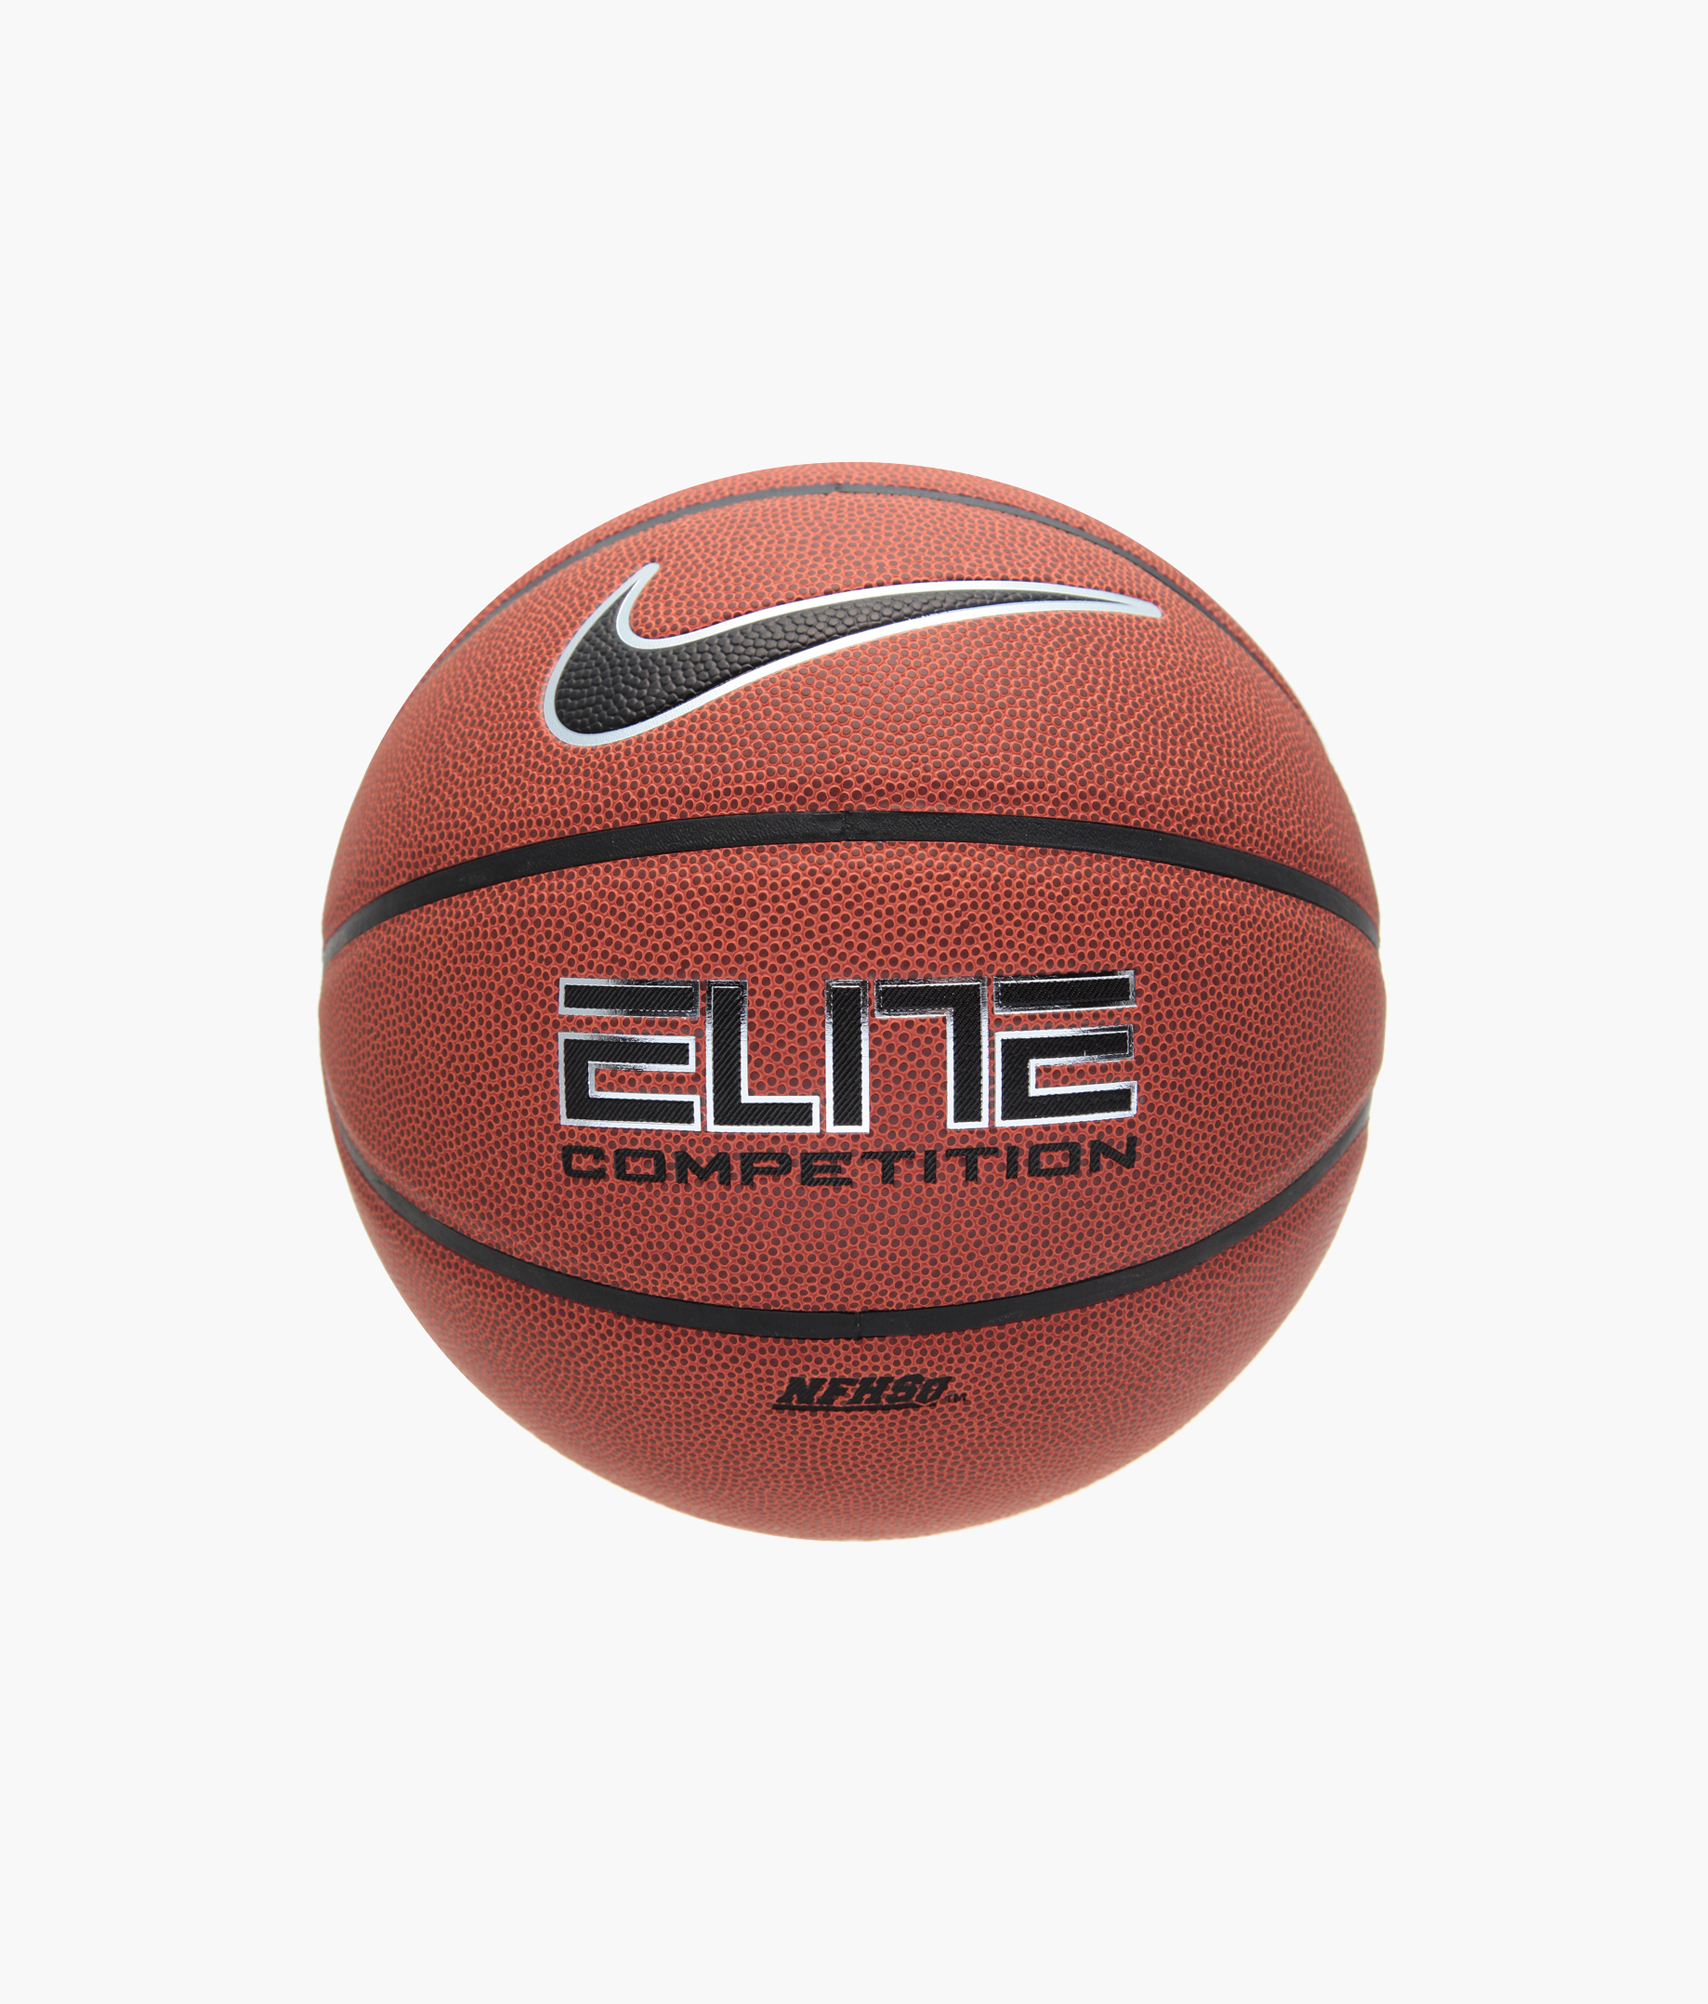 Мяч баскетбольный Nike Nike Цвет-Оранжевый баскетбольный мяч nike hyper elite 8p 06 n kl 02 855